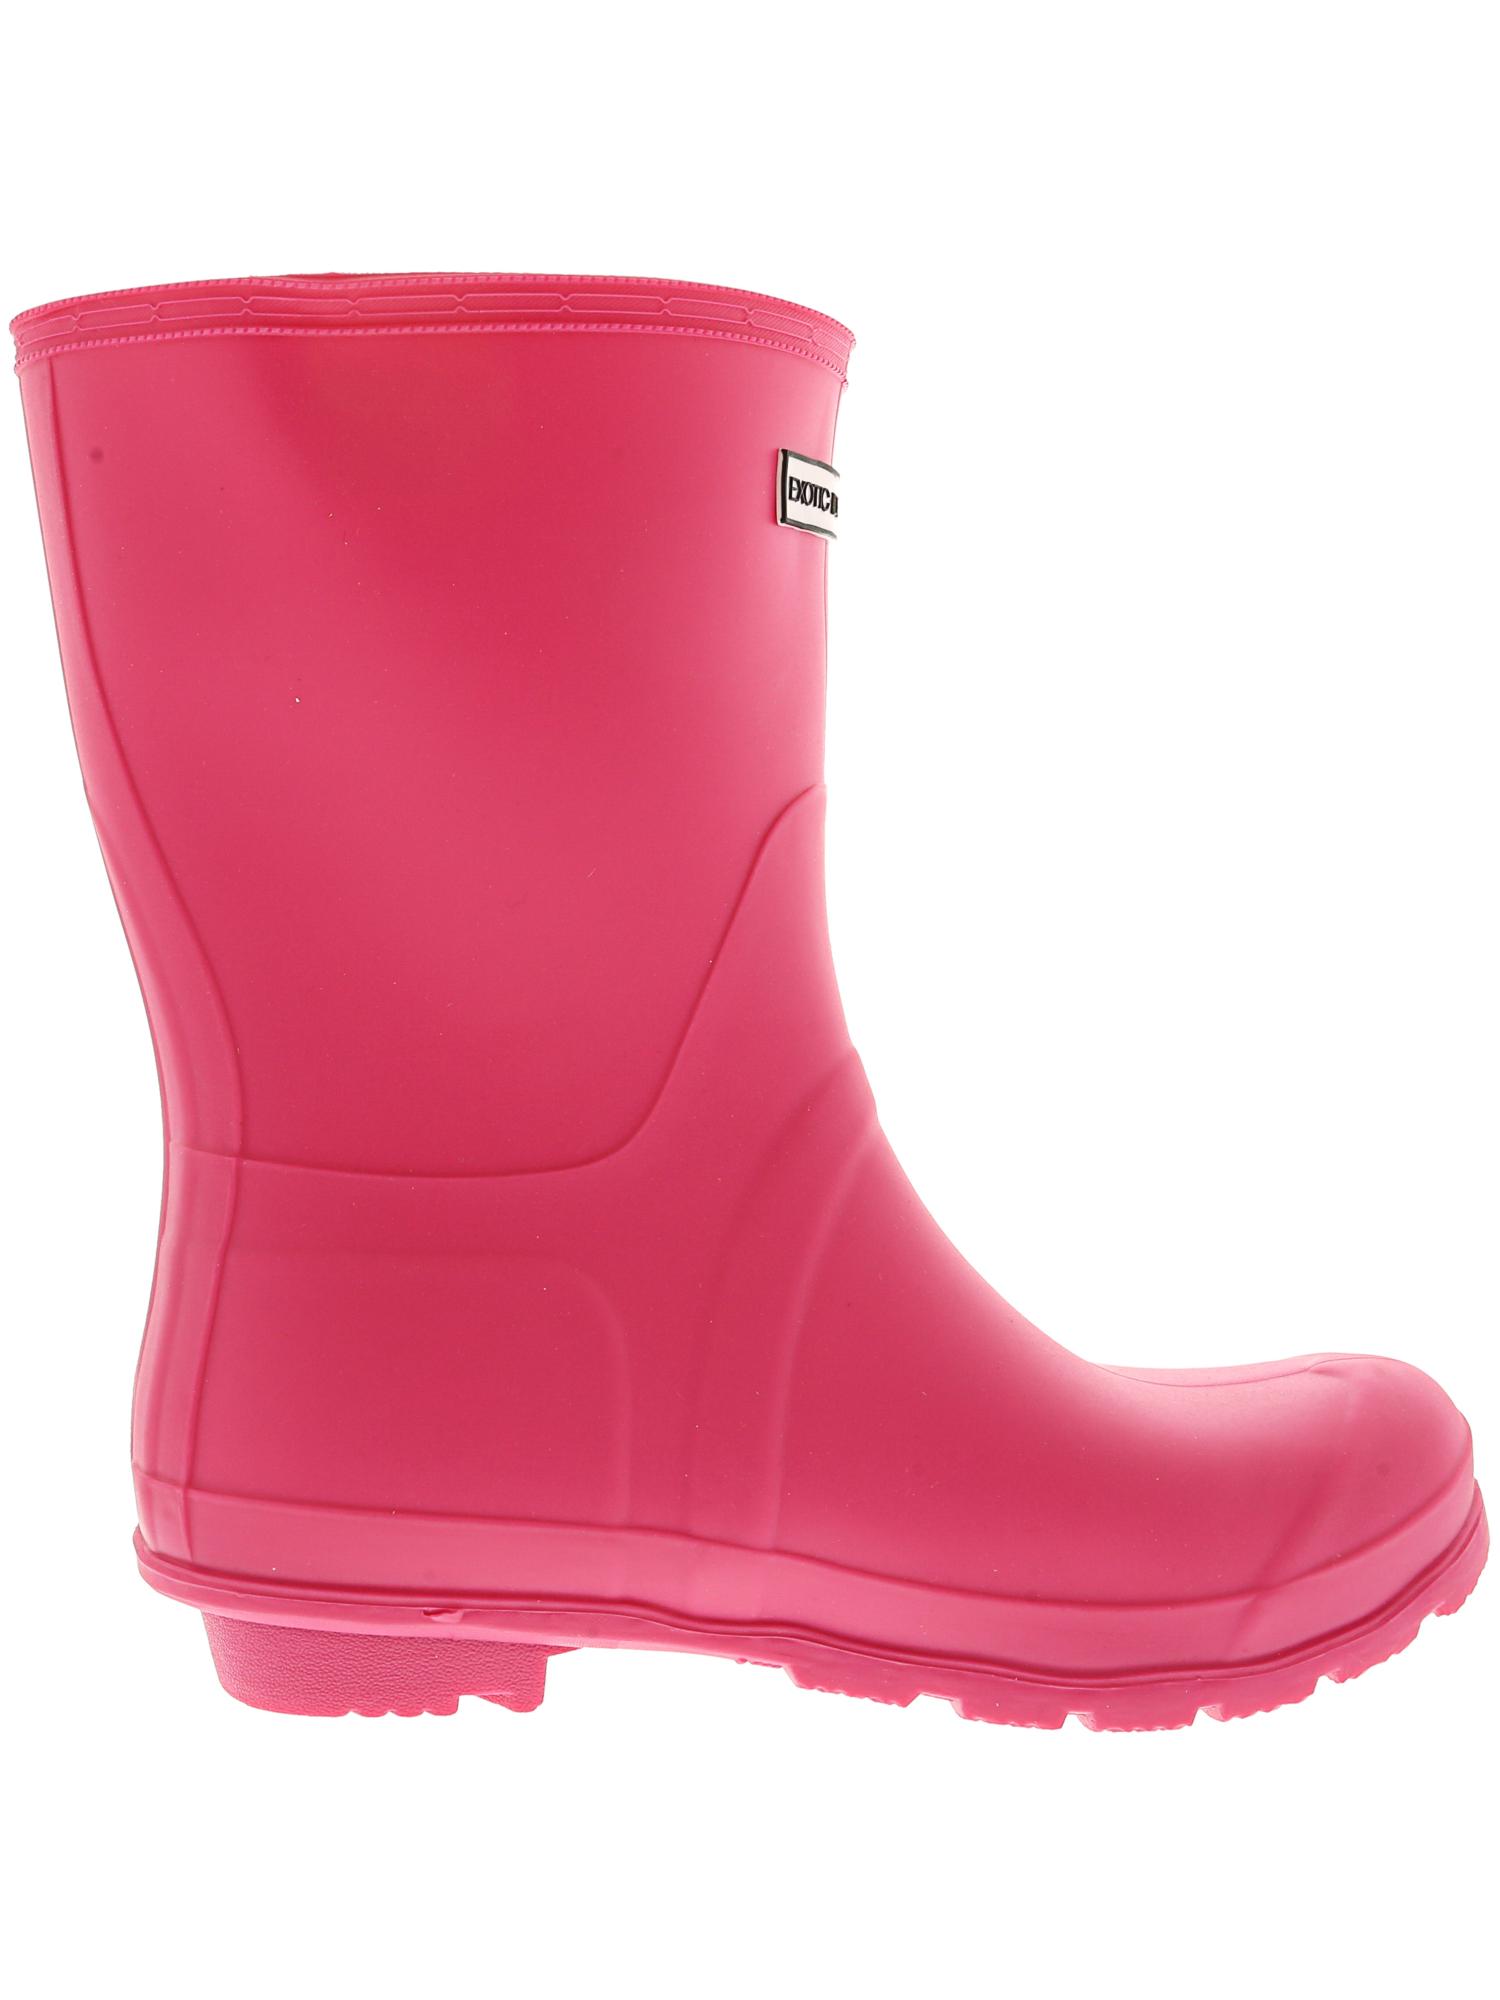 Exotic-Identity-Short-Rain-Boots-Non-Slip-100-Waterproof-for-Women thumbnail 12